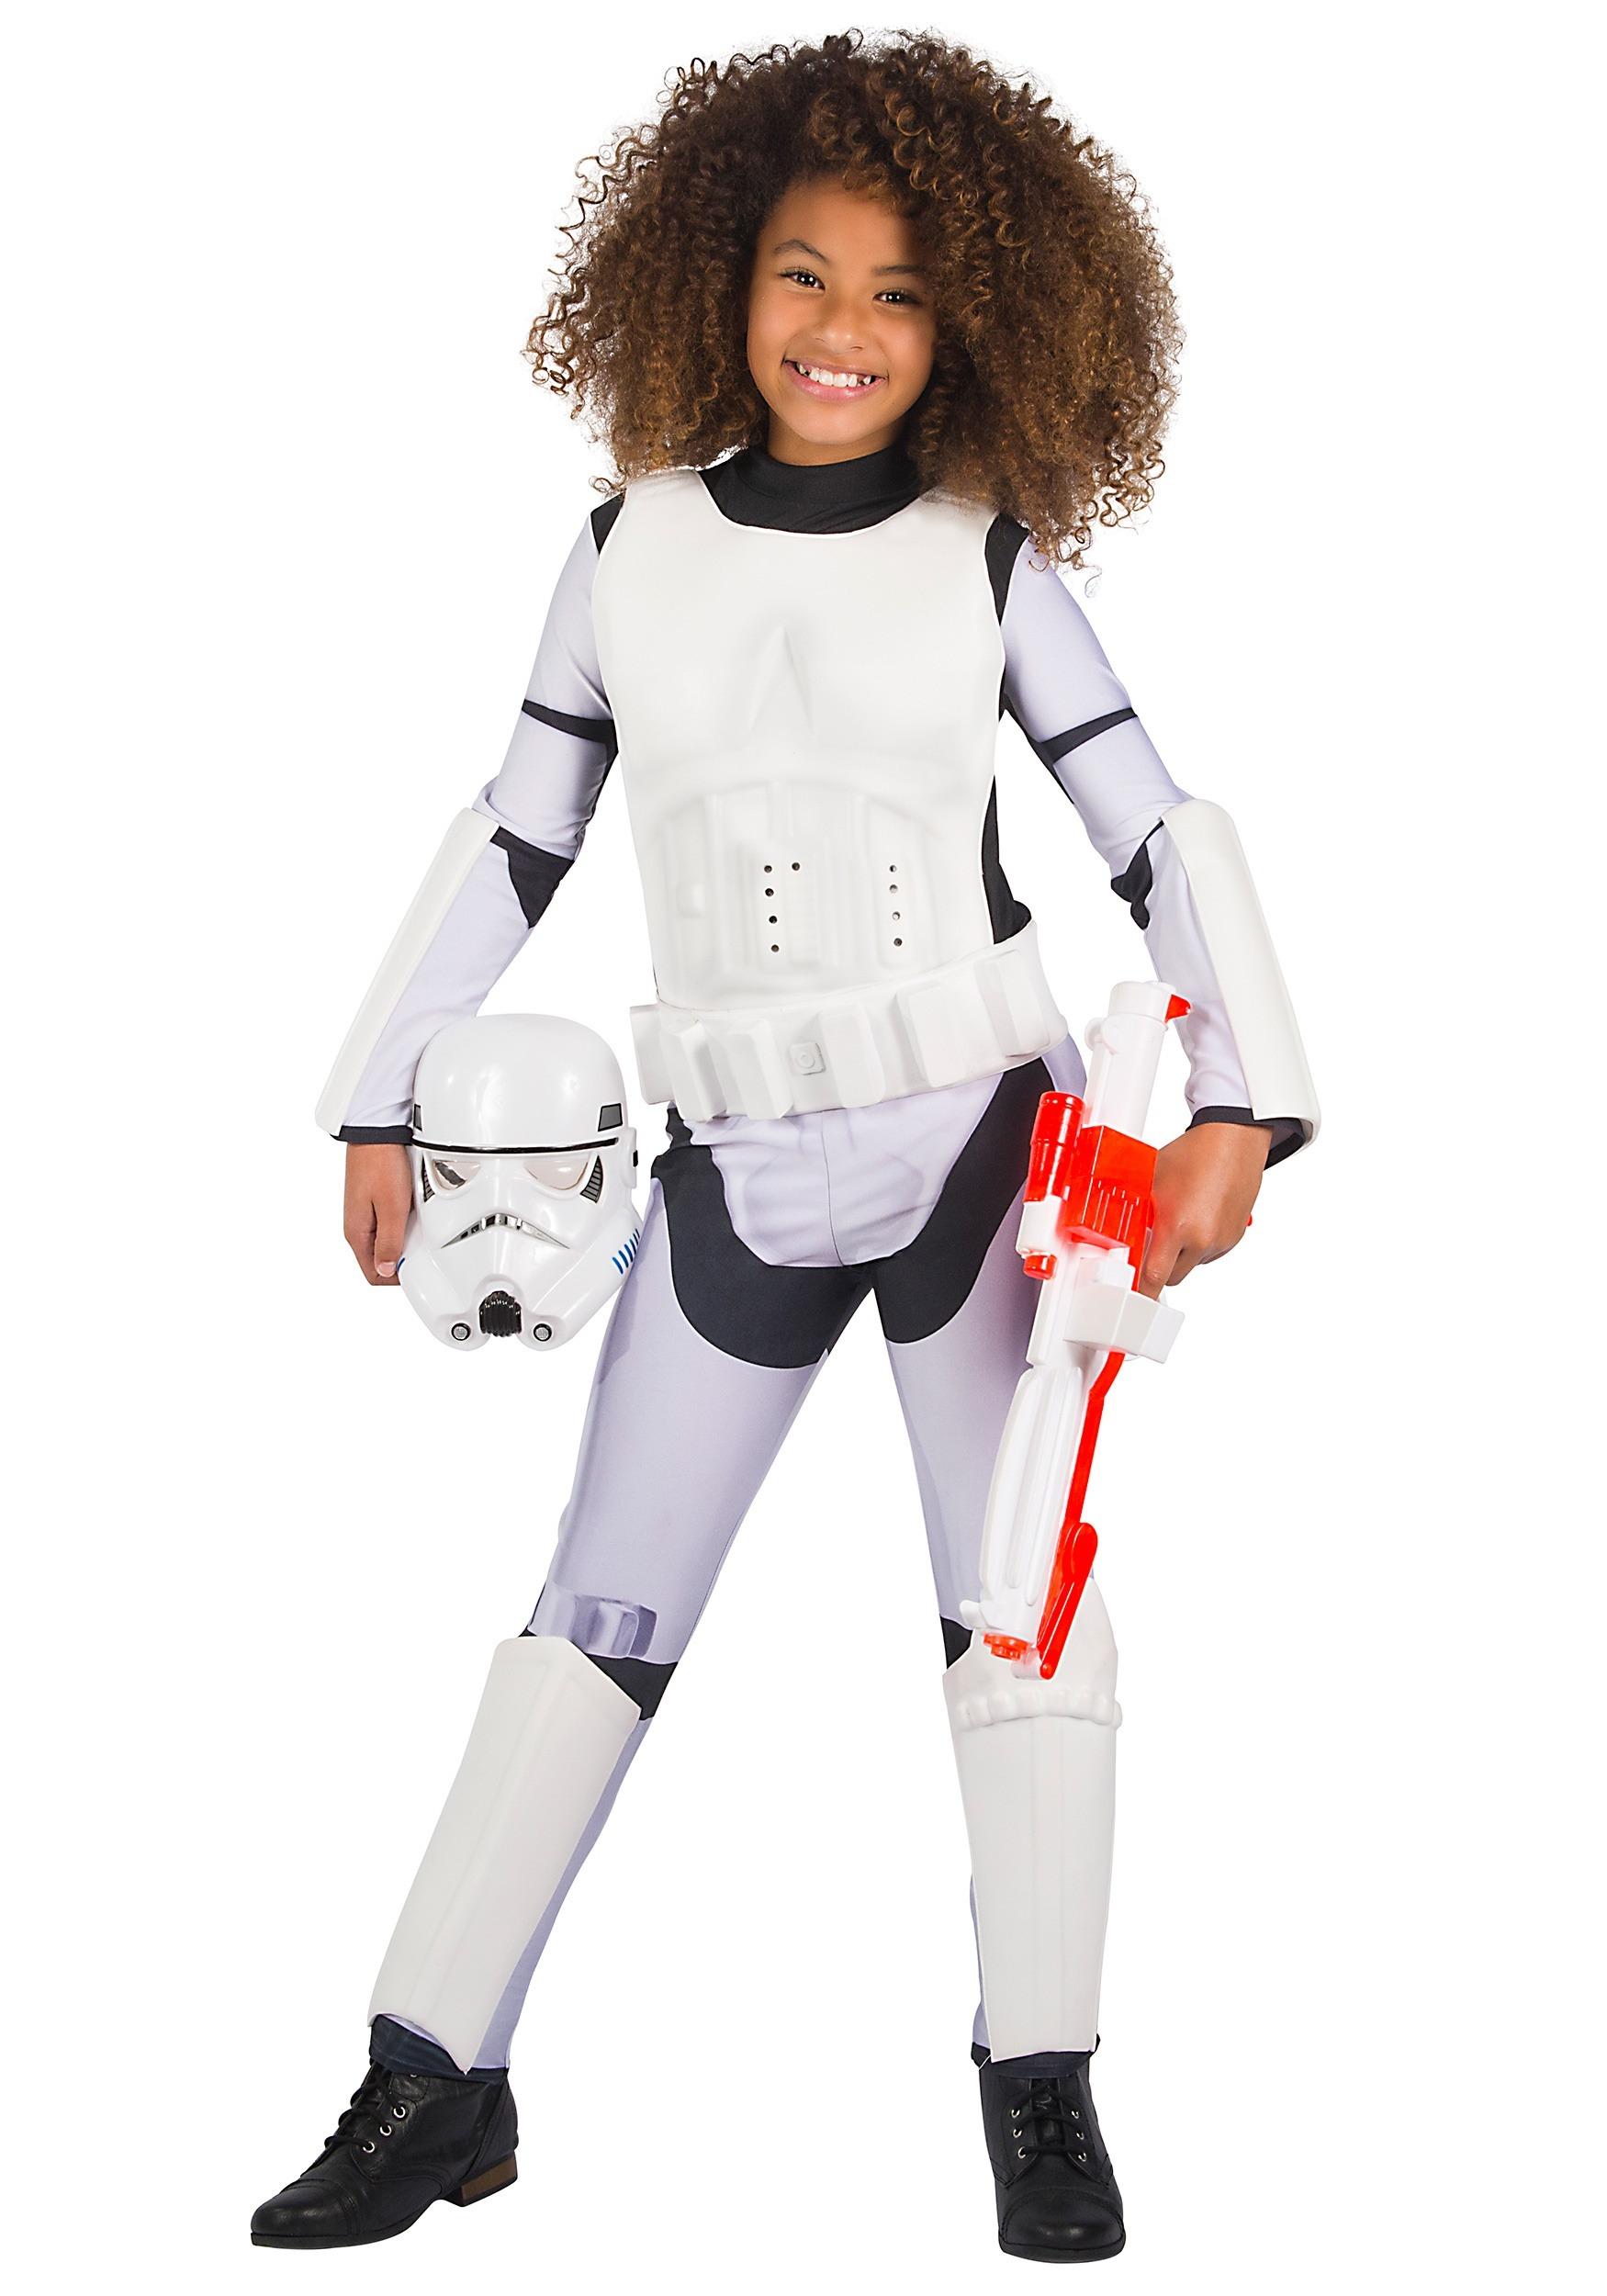 Star Wars Stormtrooper Costume for Girls